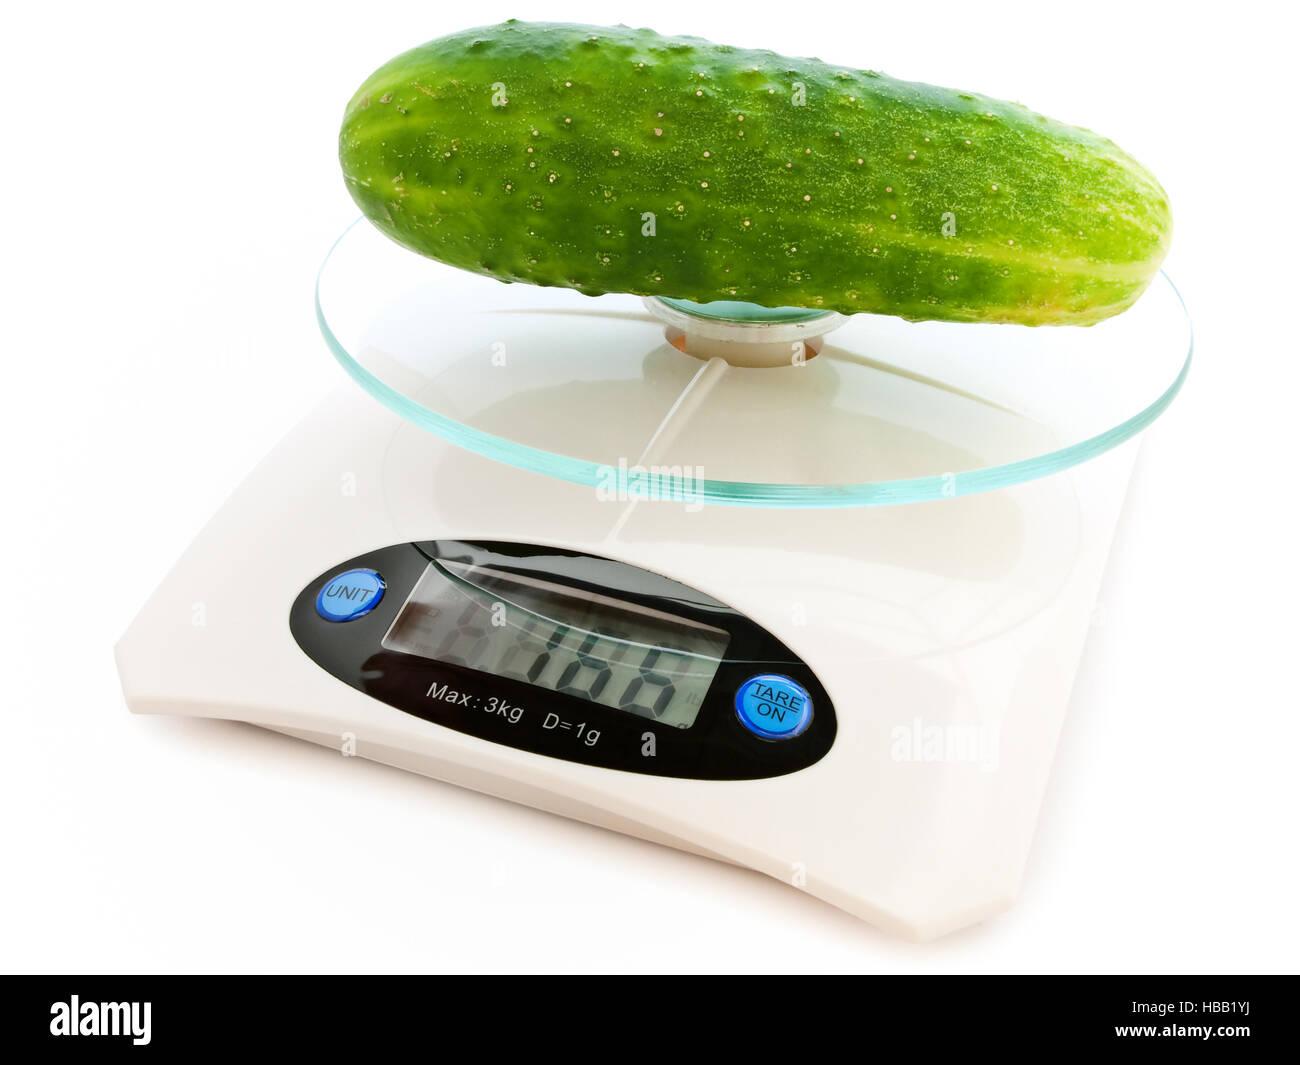 Cucumber - Stock Image